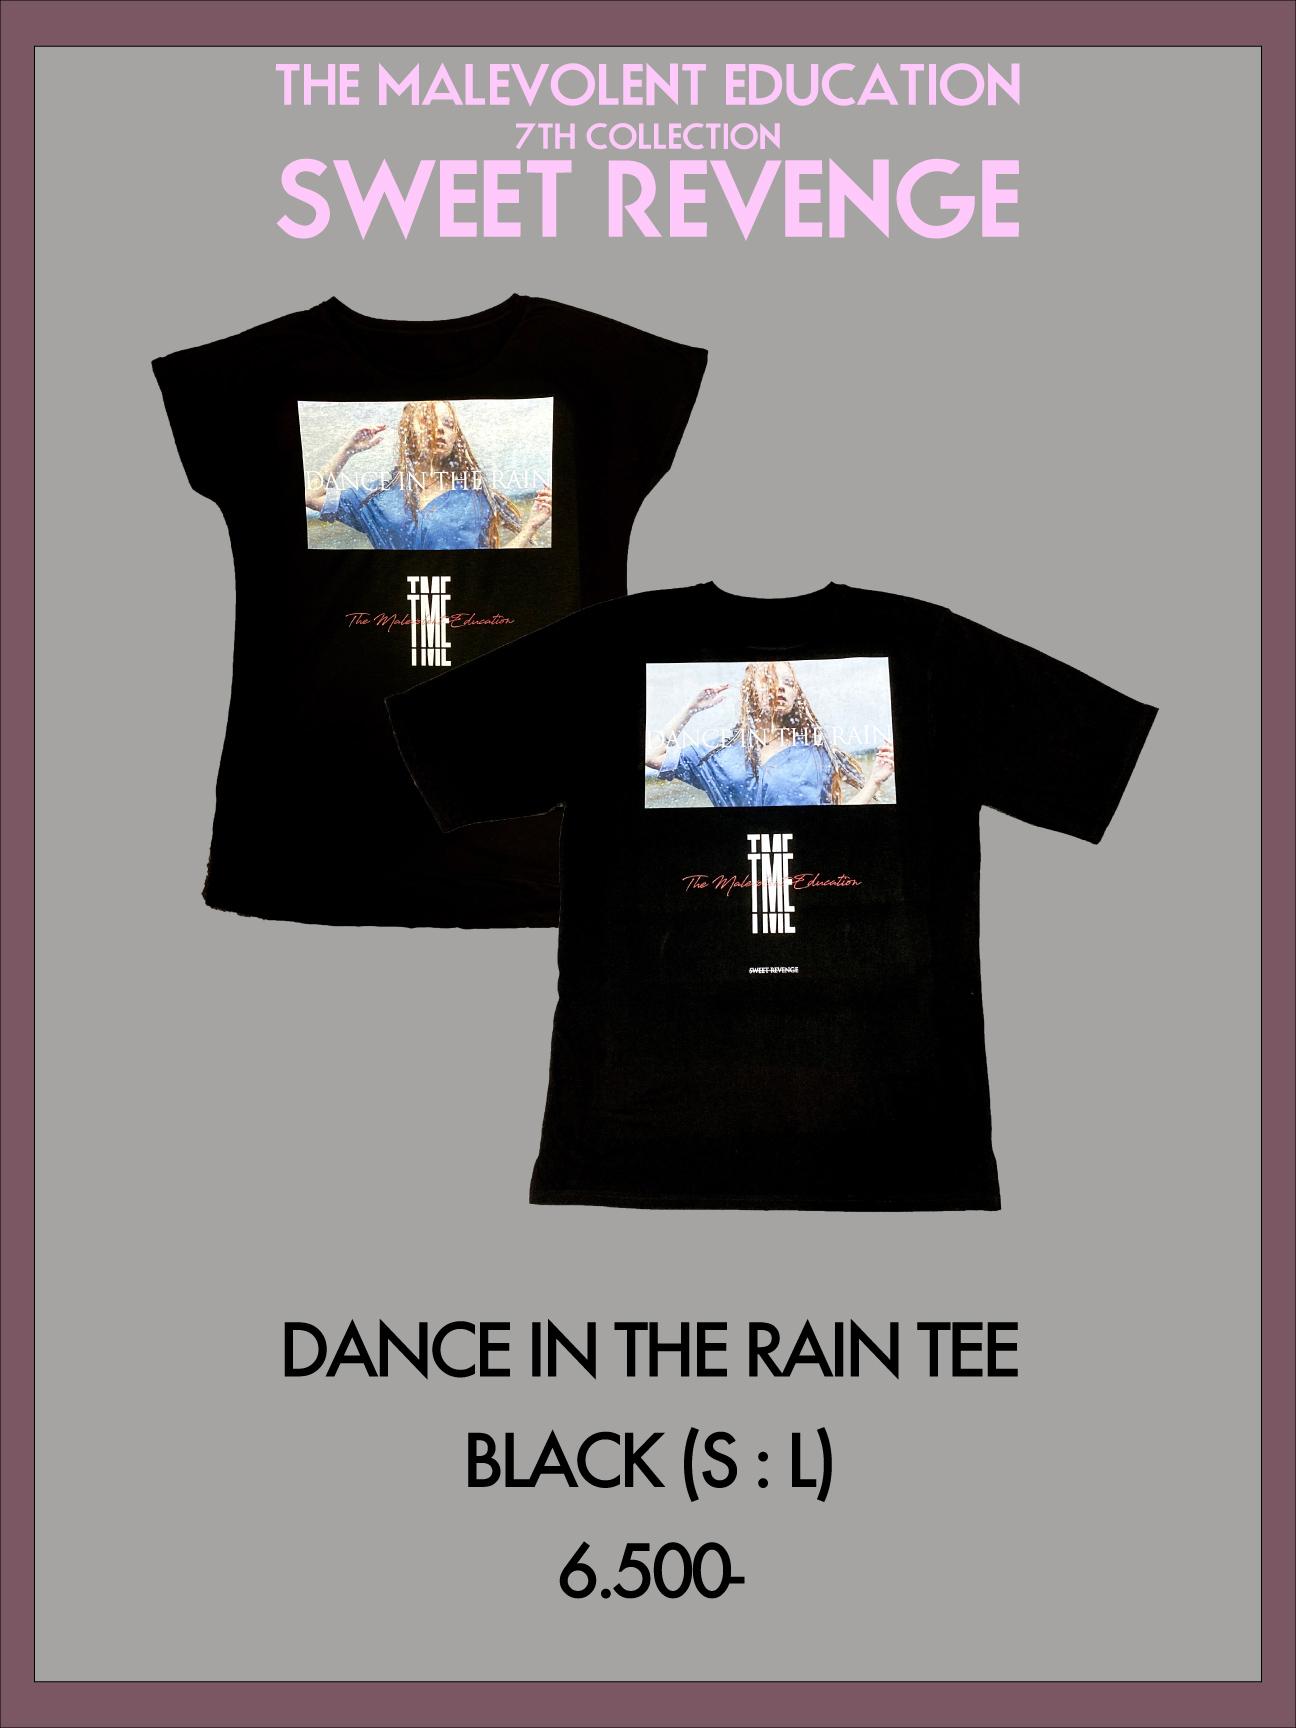 DANCE IN THE RAIN TEE(BLACK) S / L